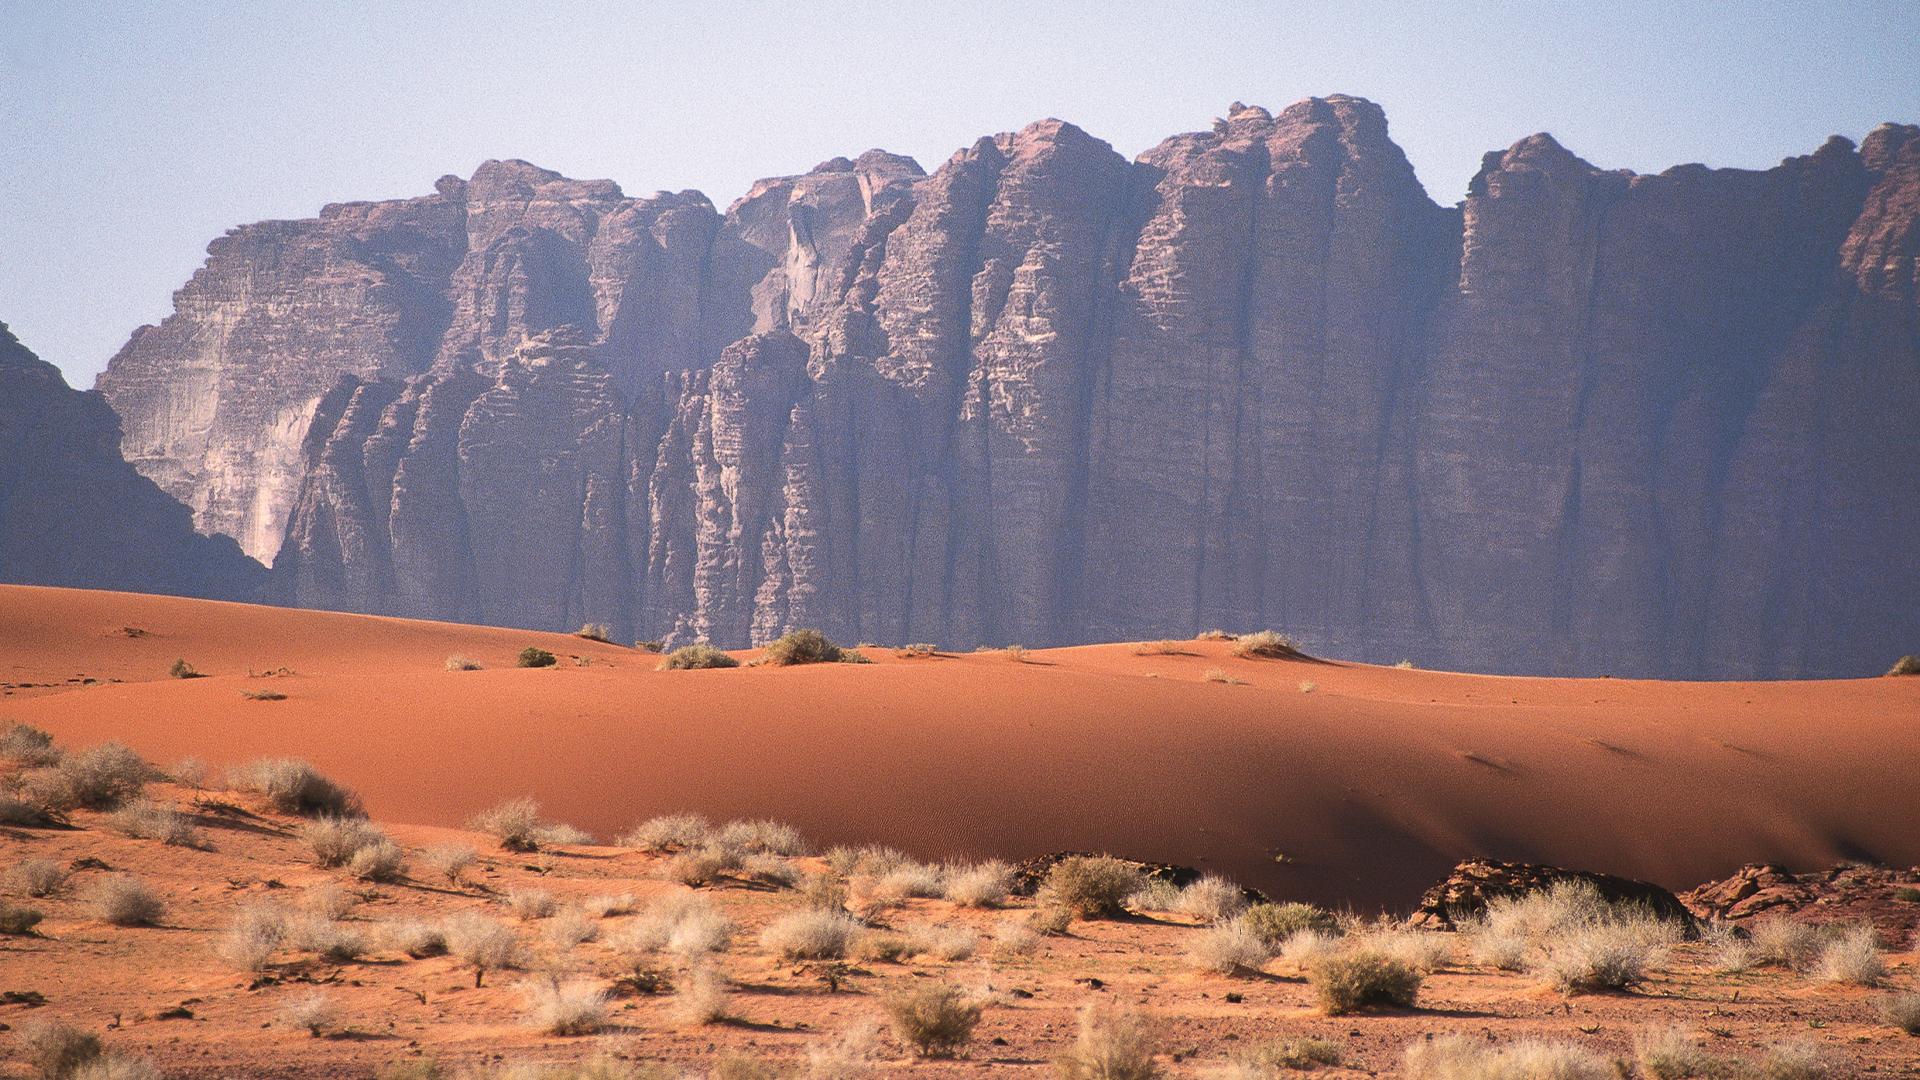 Wadi-Rum-Landscape-in-Jordan